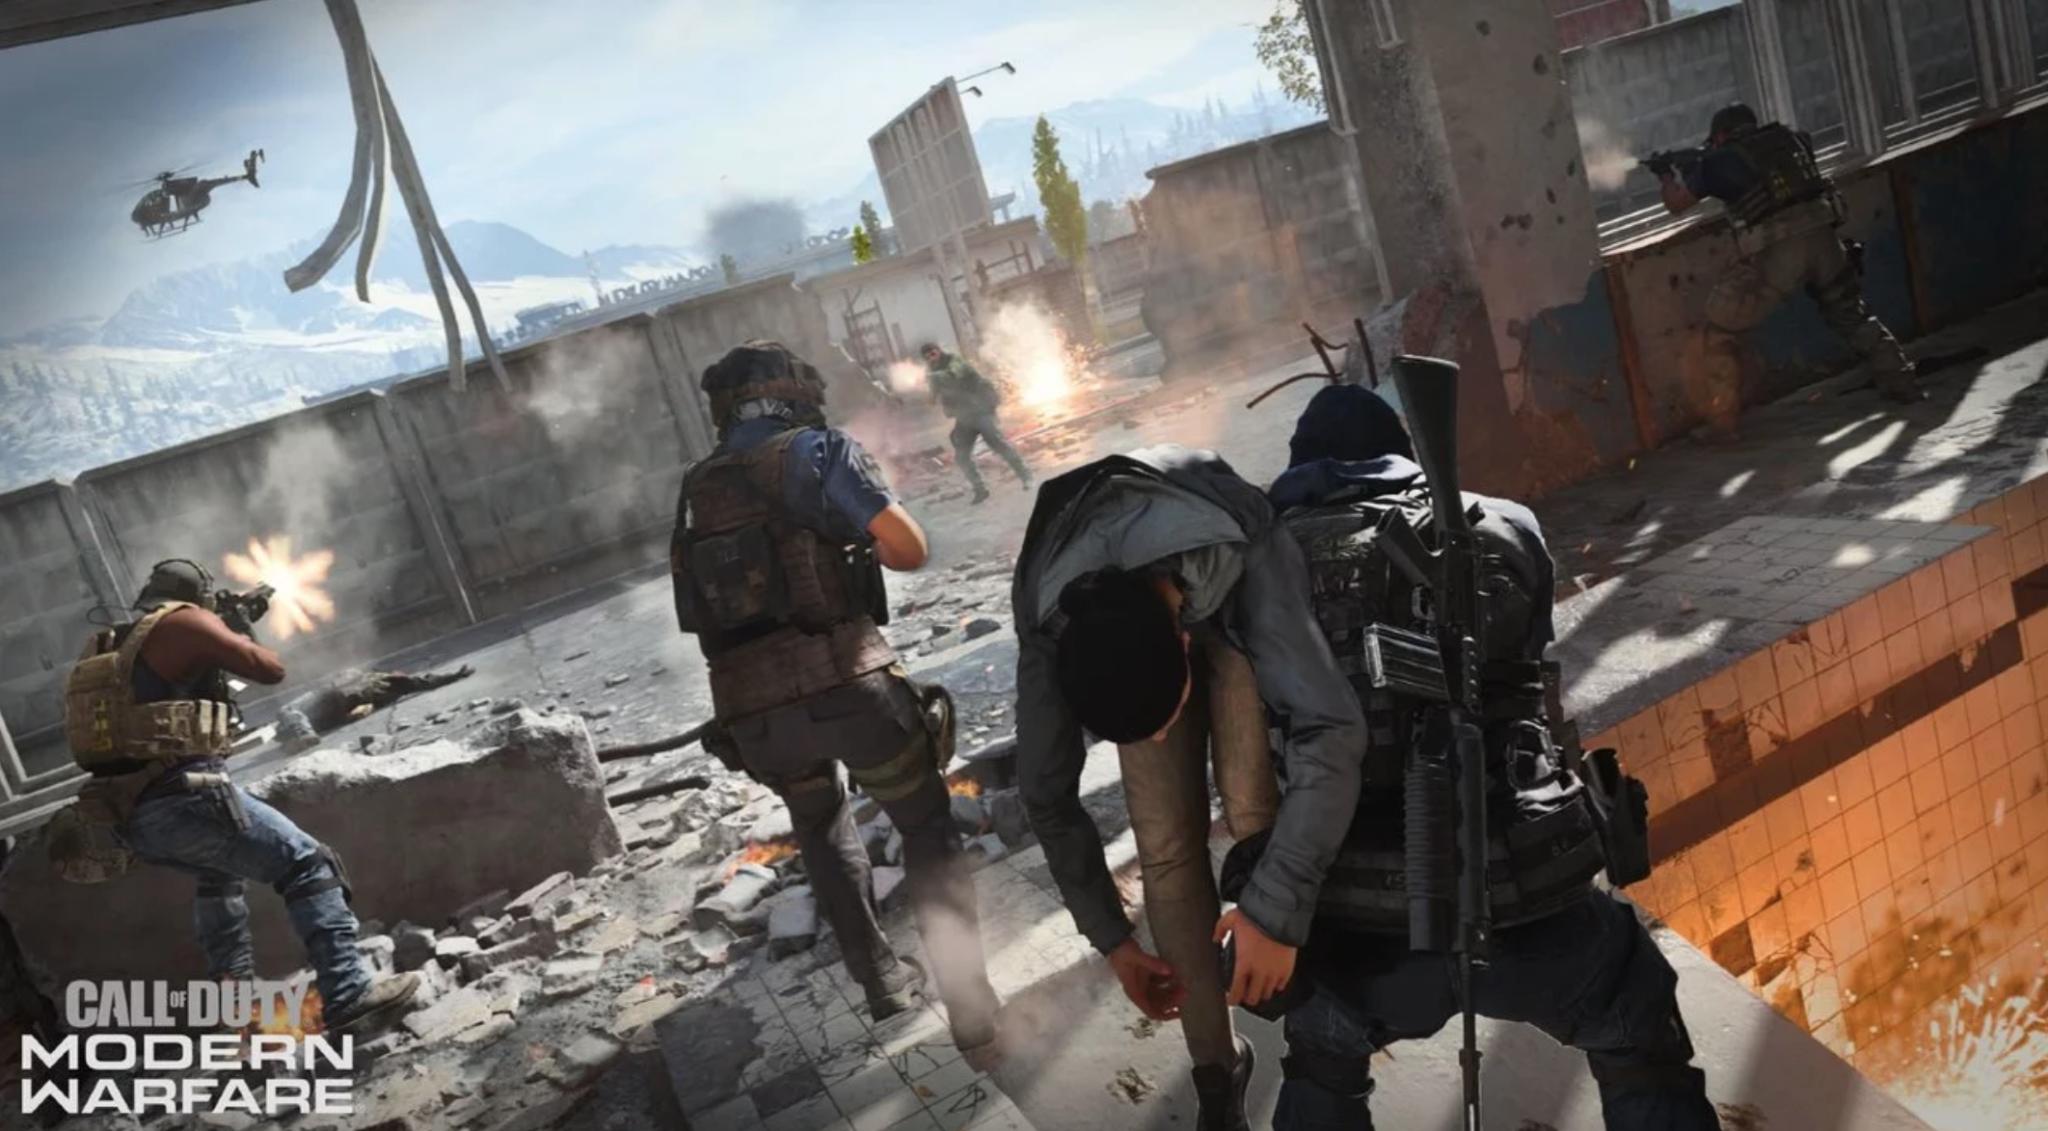 Reviving player in Modern Warfare.